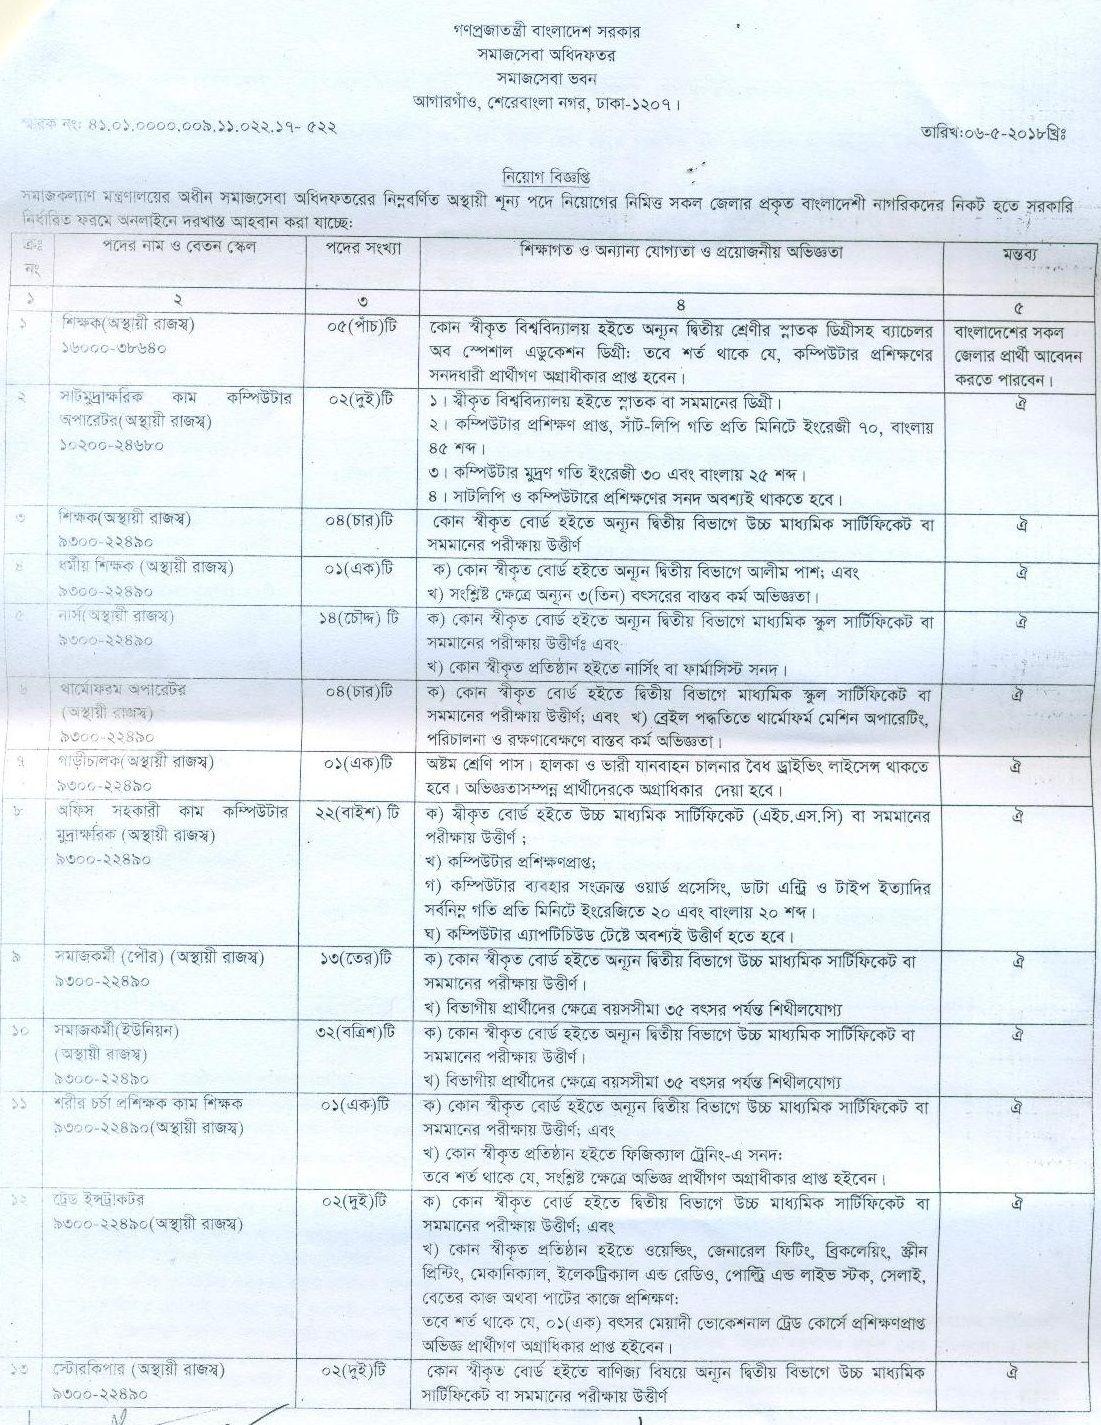 Department of Social Services Jobs Circular | NATION TUNES